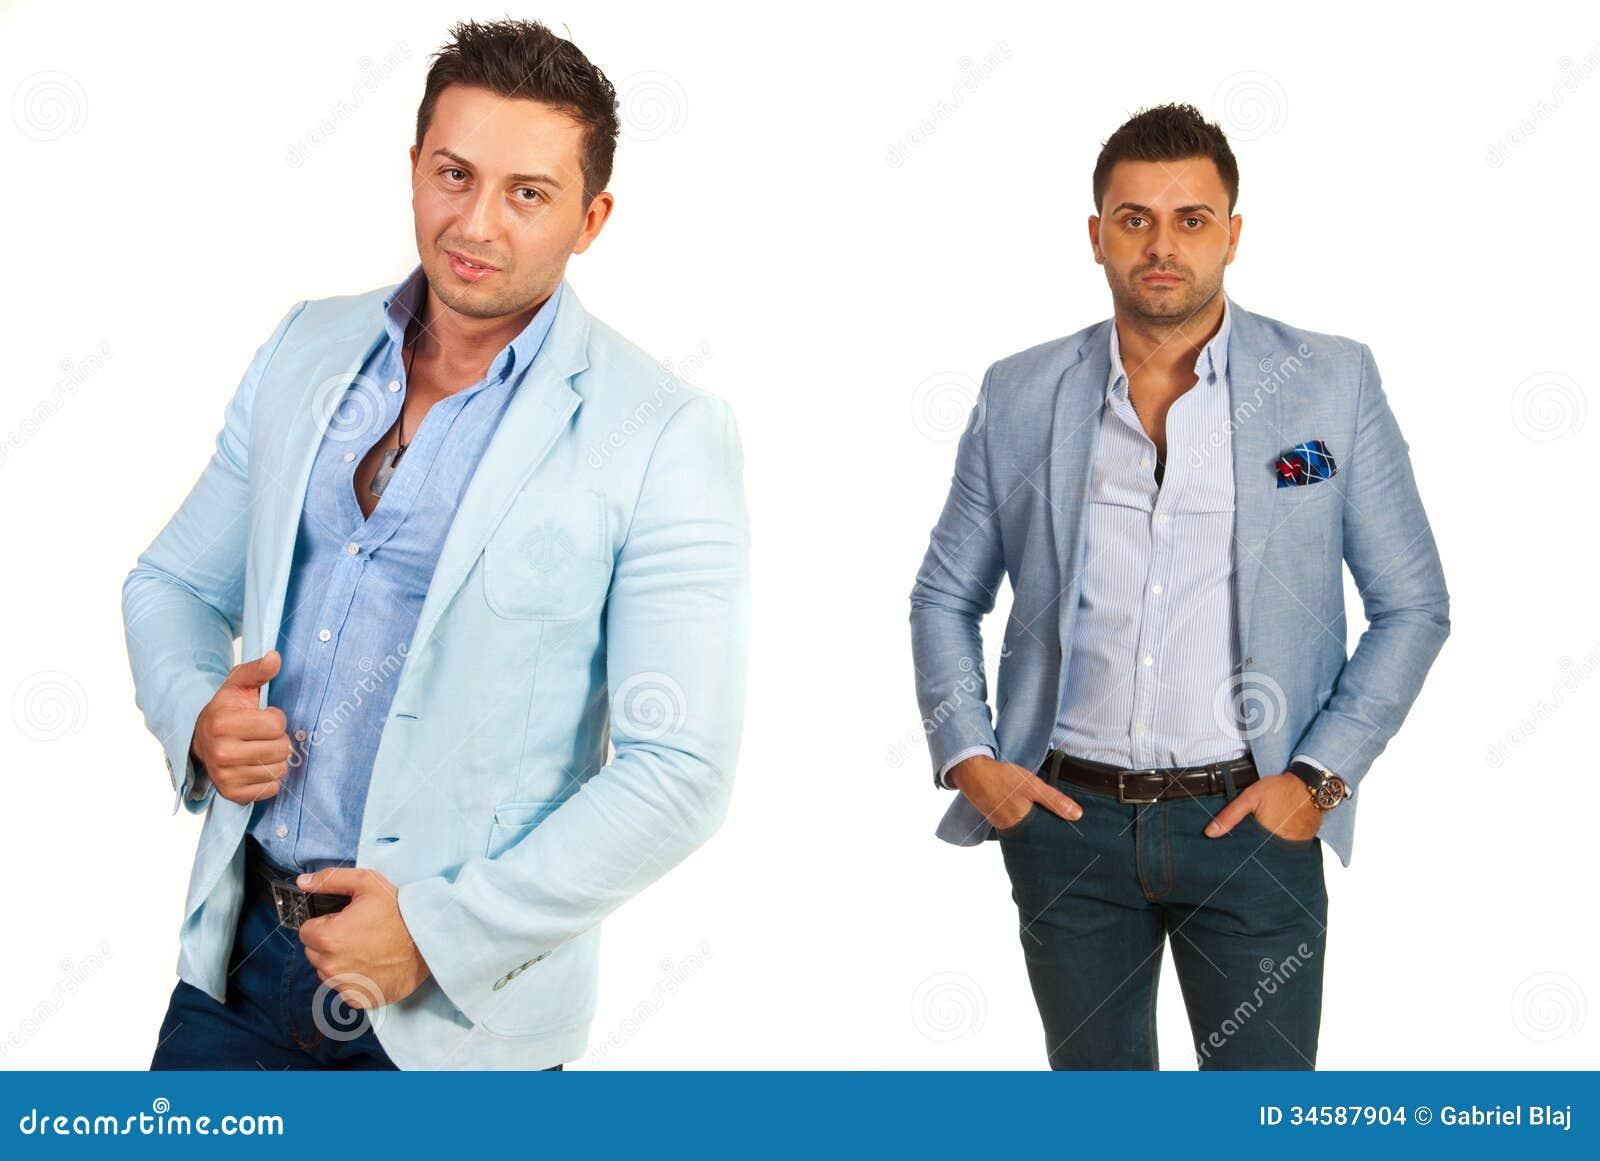 0c76a9a6ce4f Ελκυστικά άτομα στα περιστασιακά κοστούμια Στοκ Εικόνες - εικόνα από ...